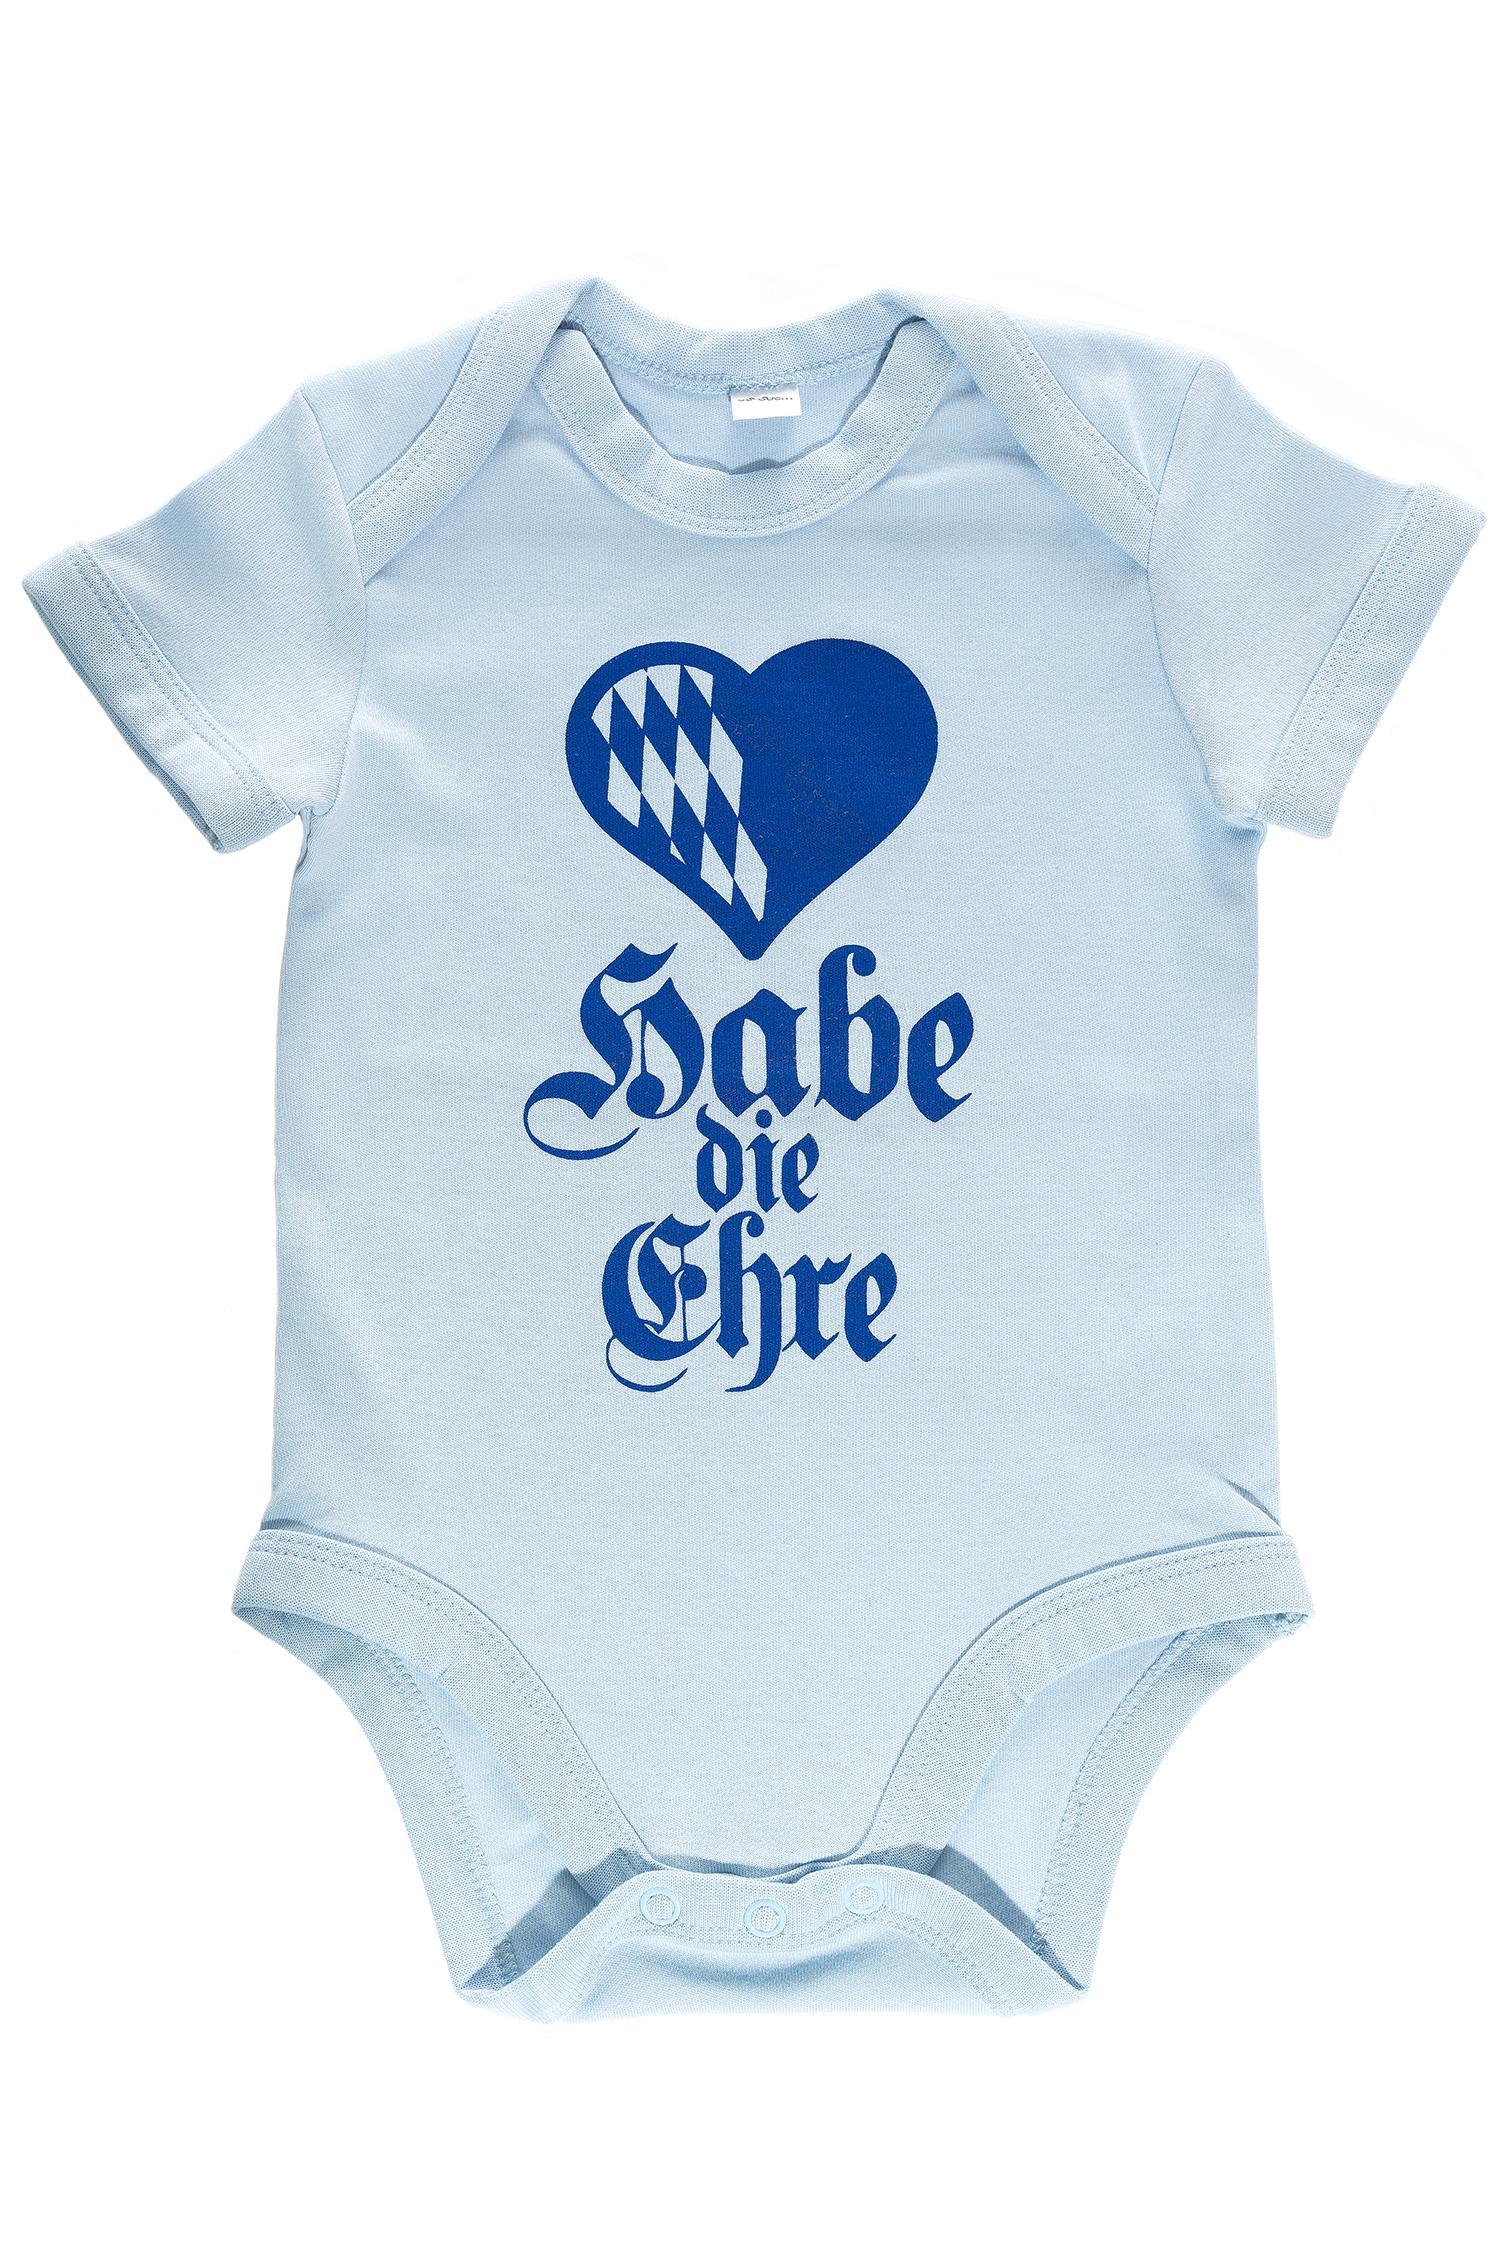 Babybody Habe die Ehre 0-3 mo | dust blue